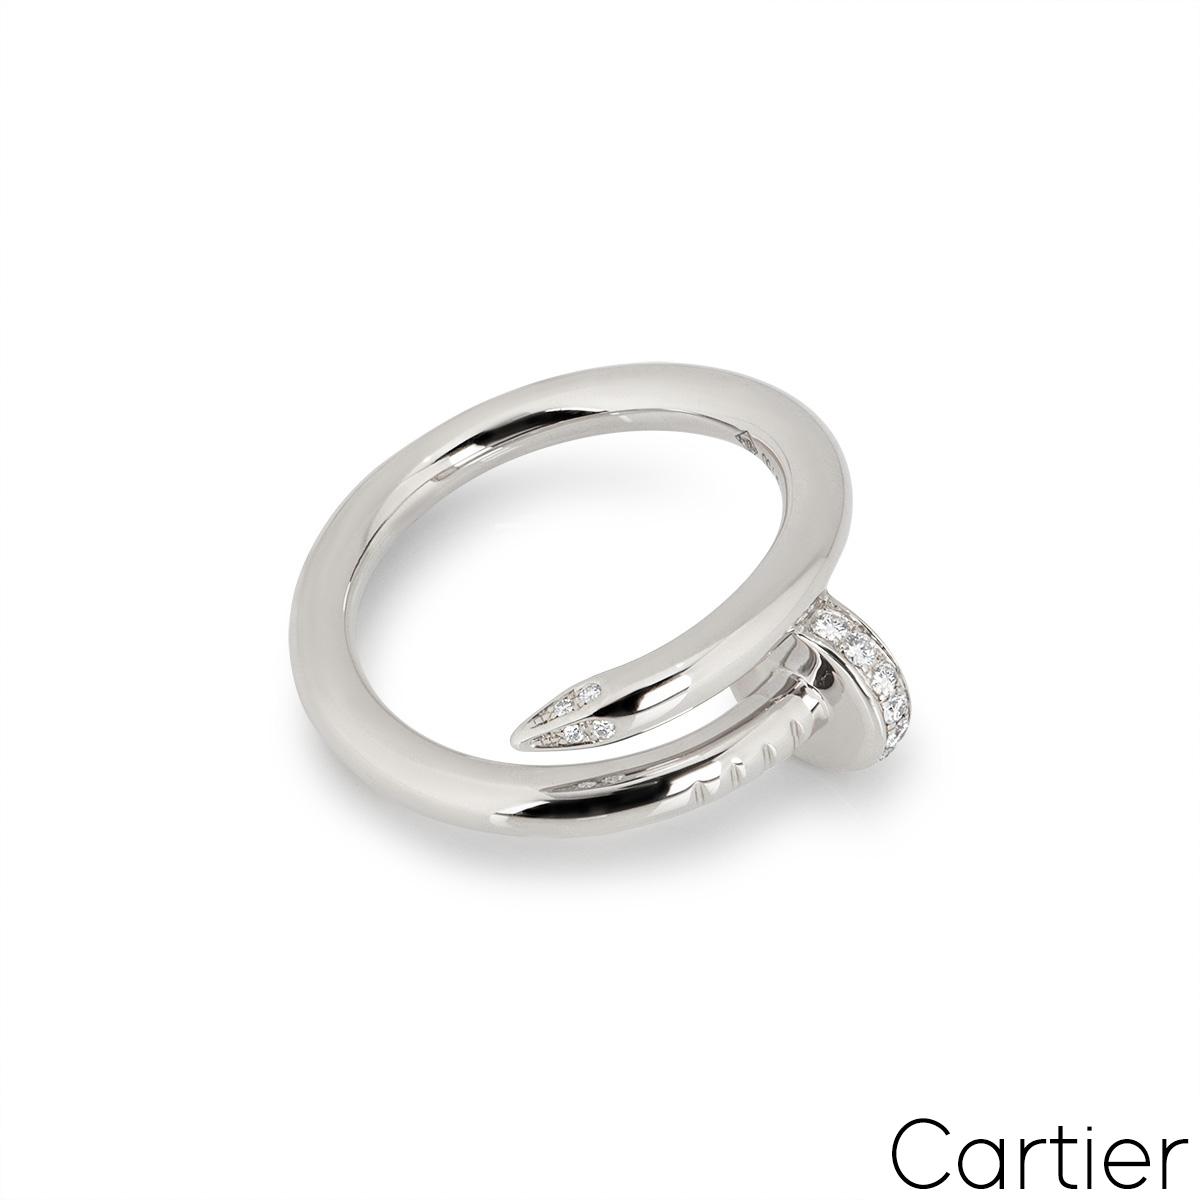 Cartier White Gold Diamond Juste Un Clou Ring Size 54 B4092700